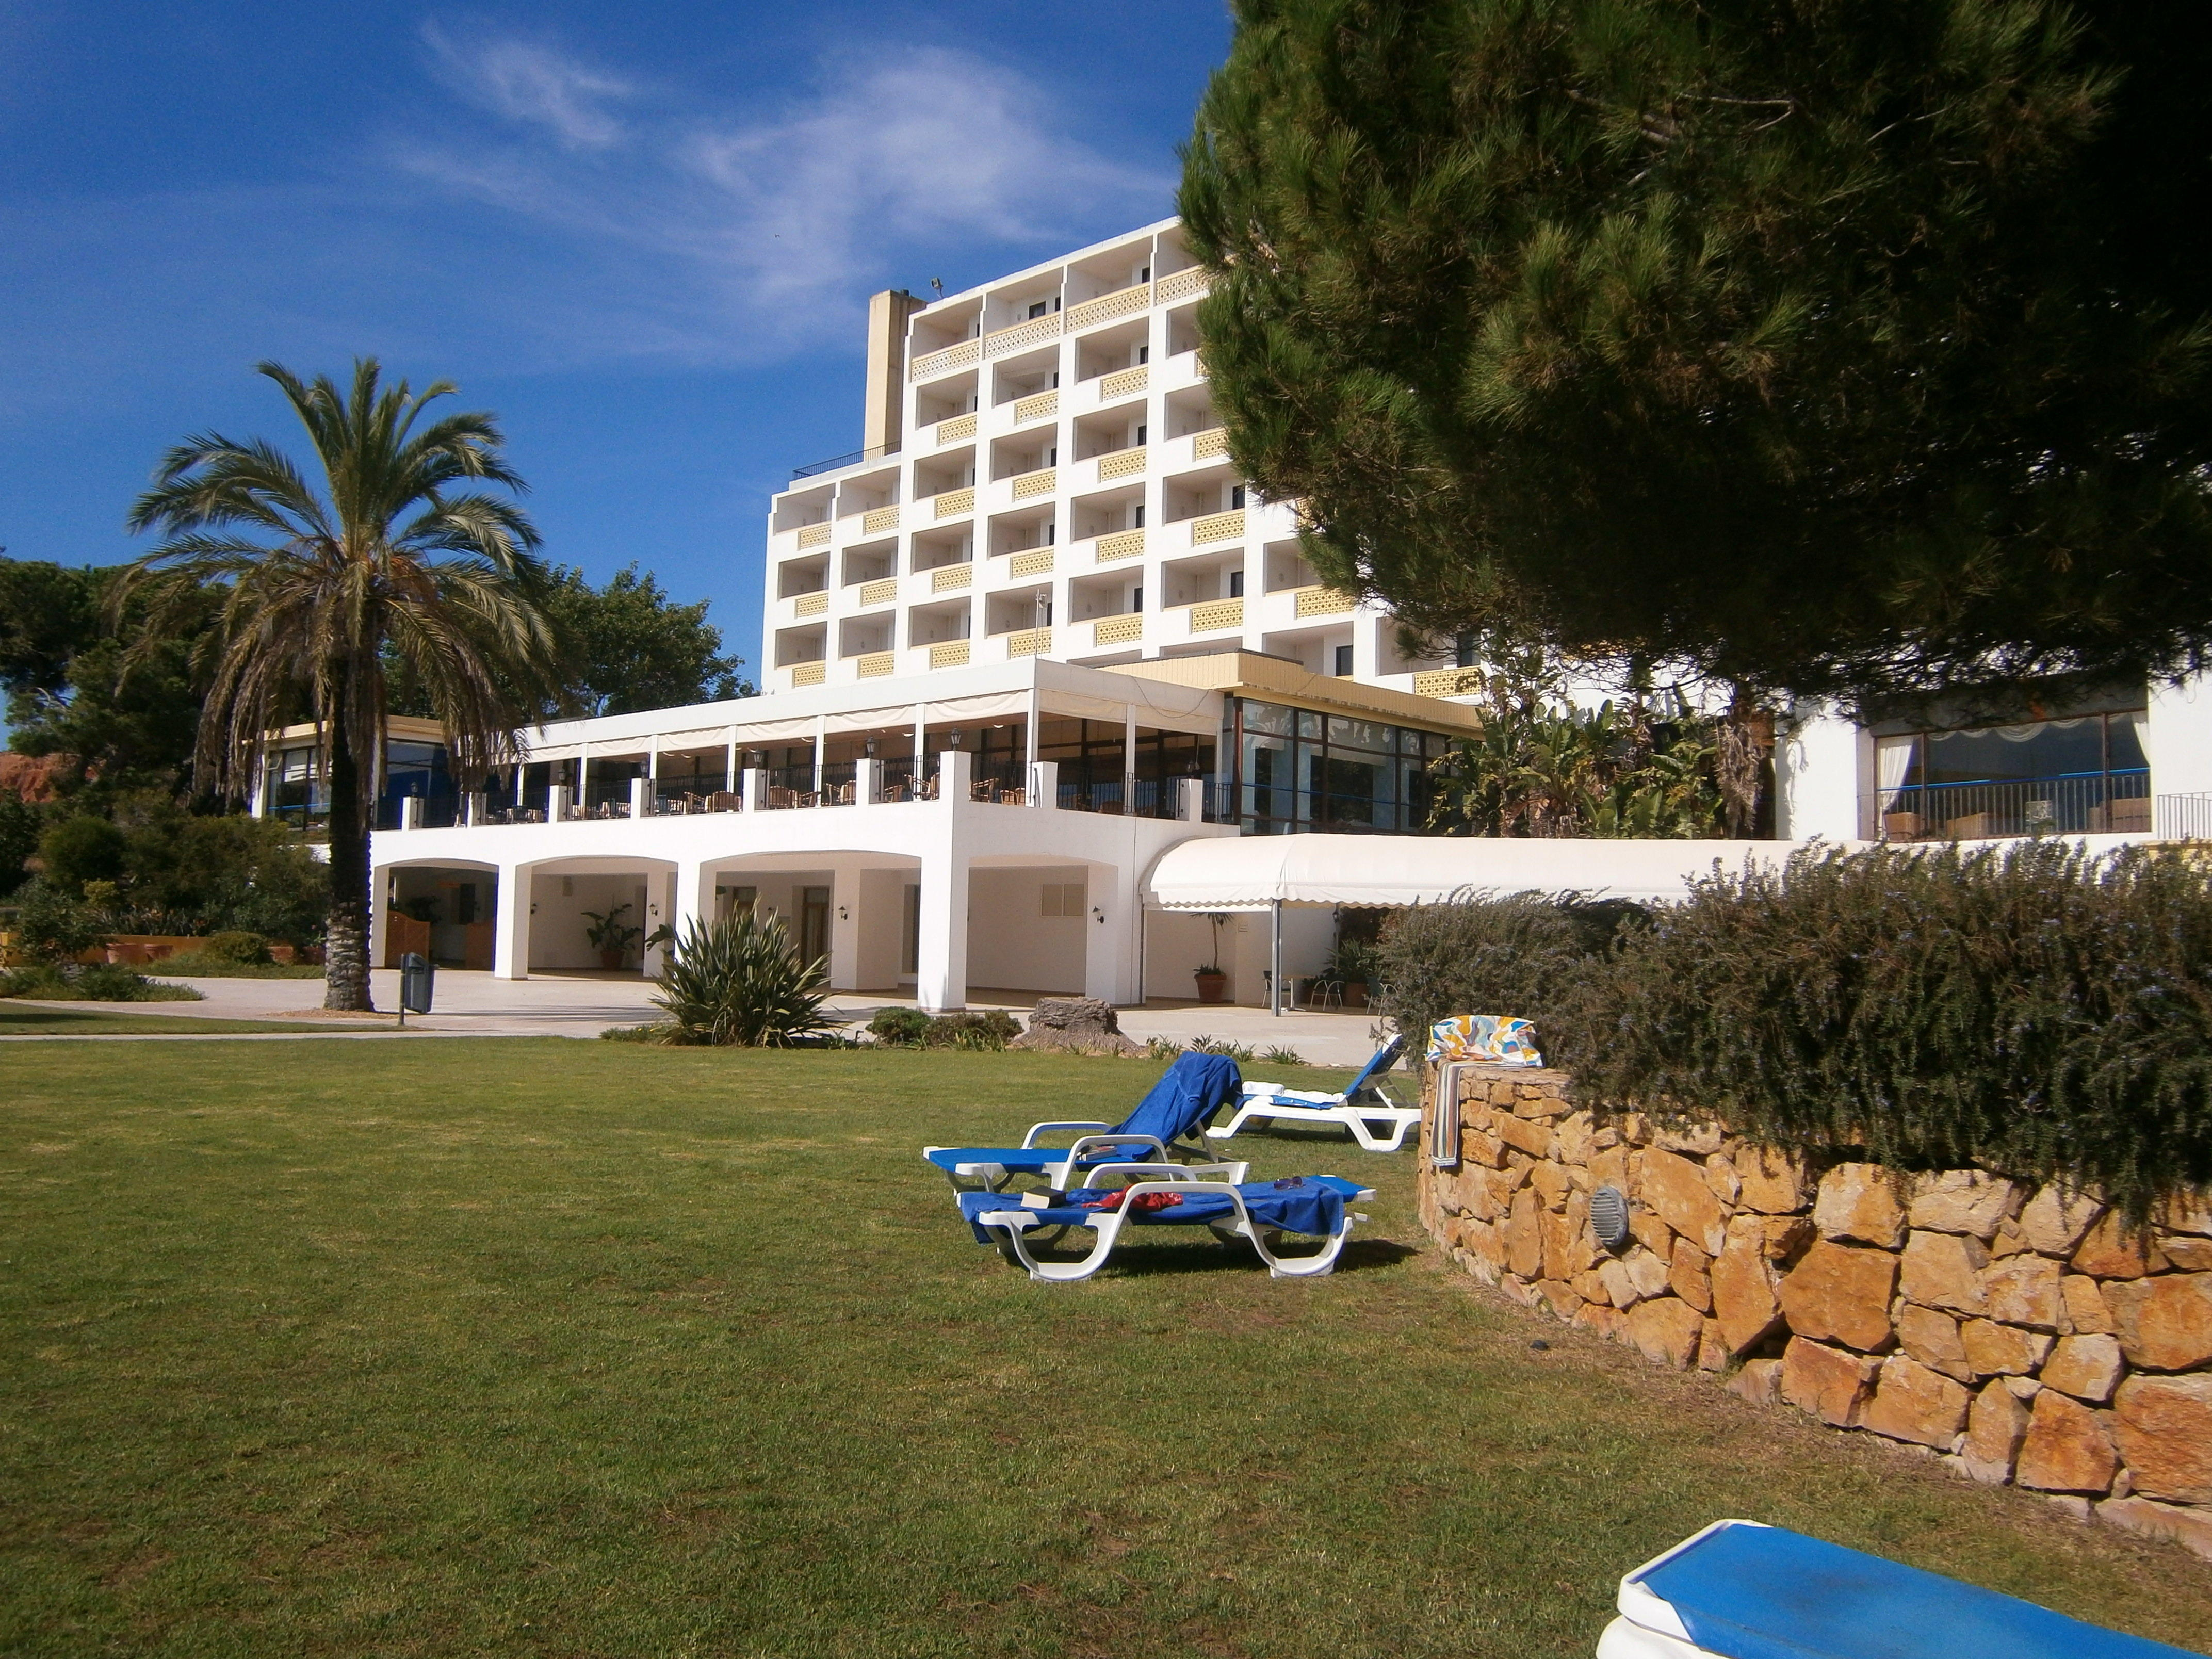 hotel alfamar beach sport resort in albufeira. Black Bedroom Furniture Sets. Home Design Ideas